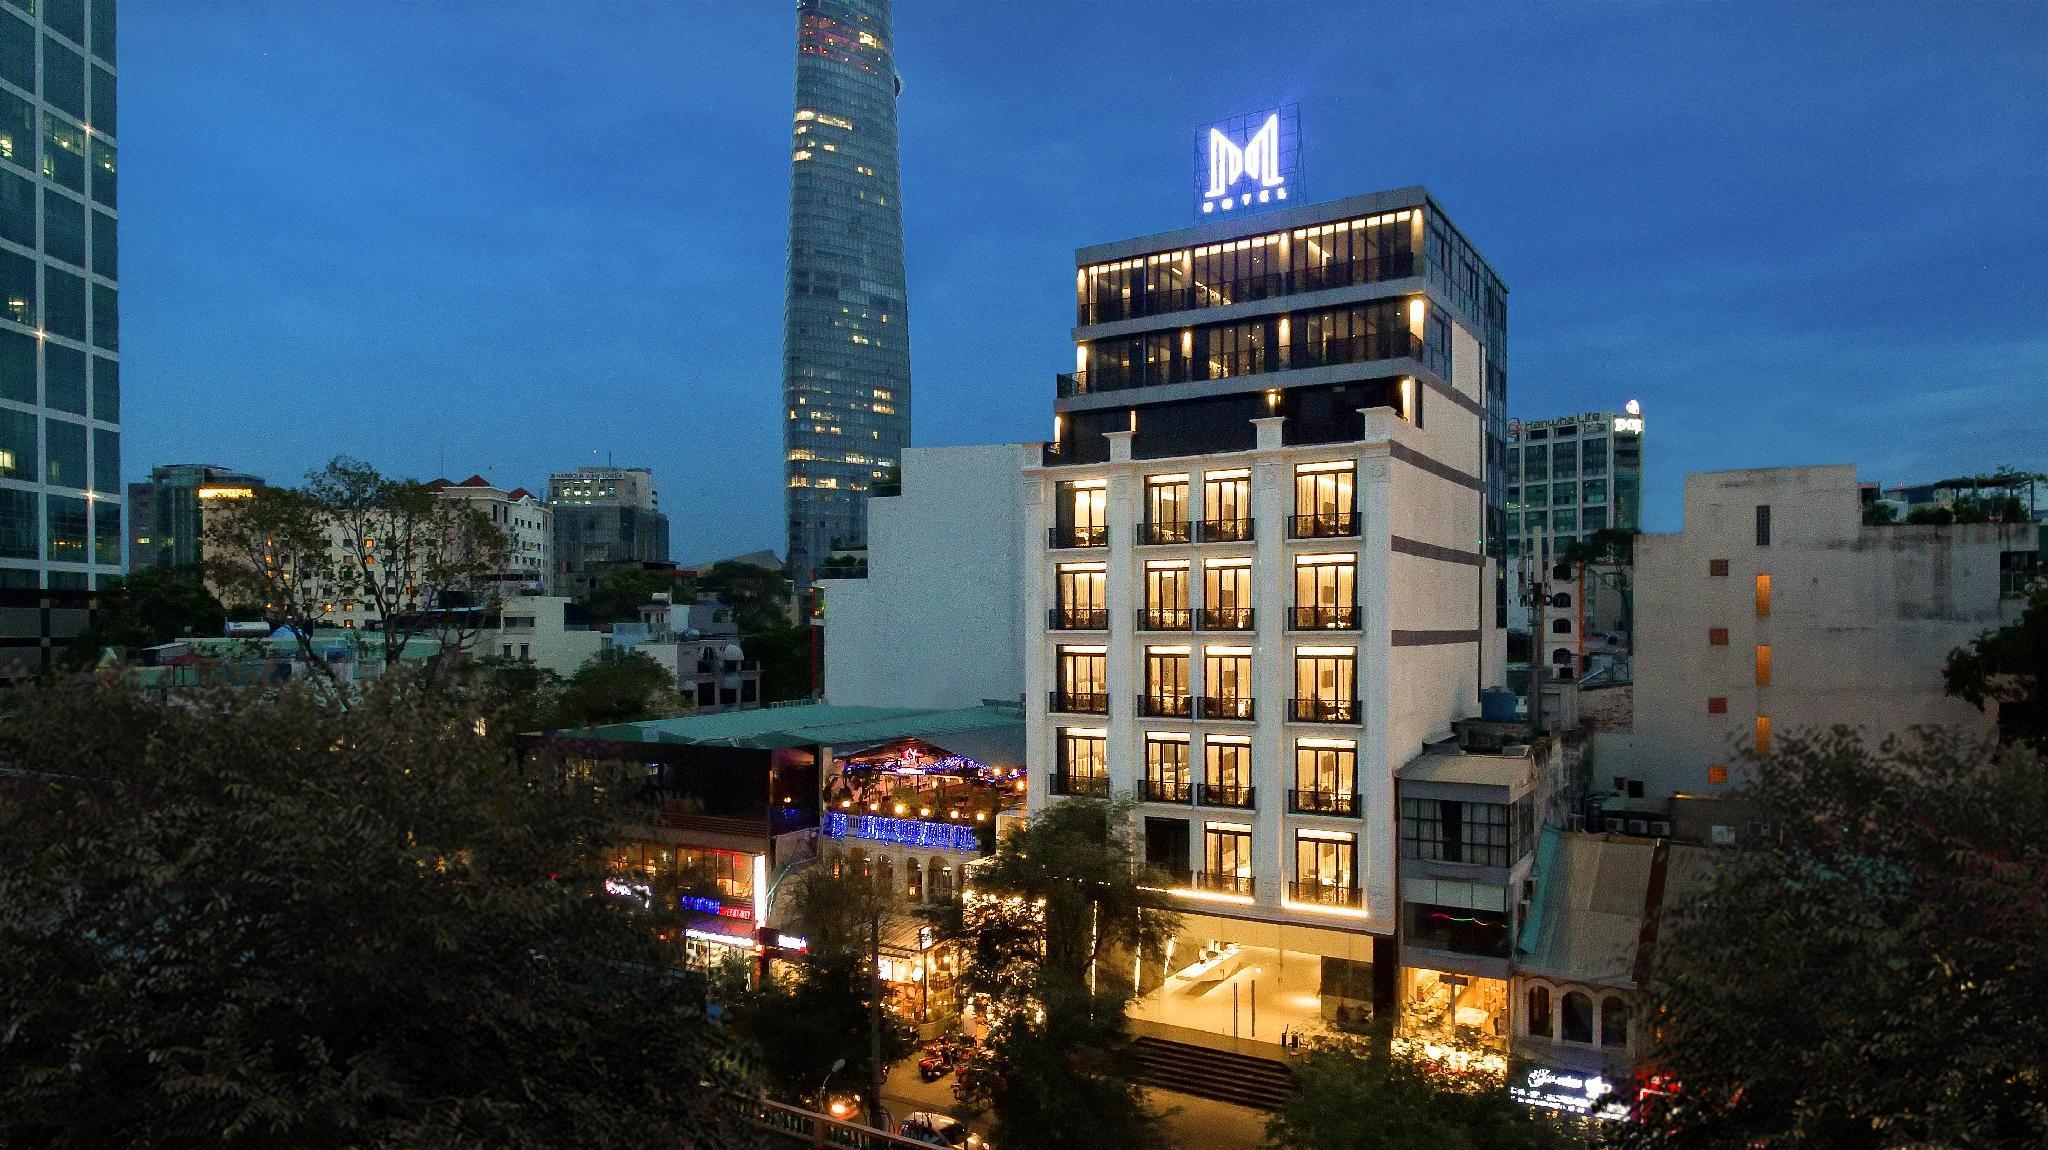 Saigon M Hotel